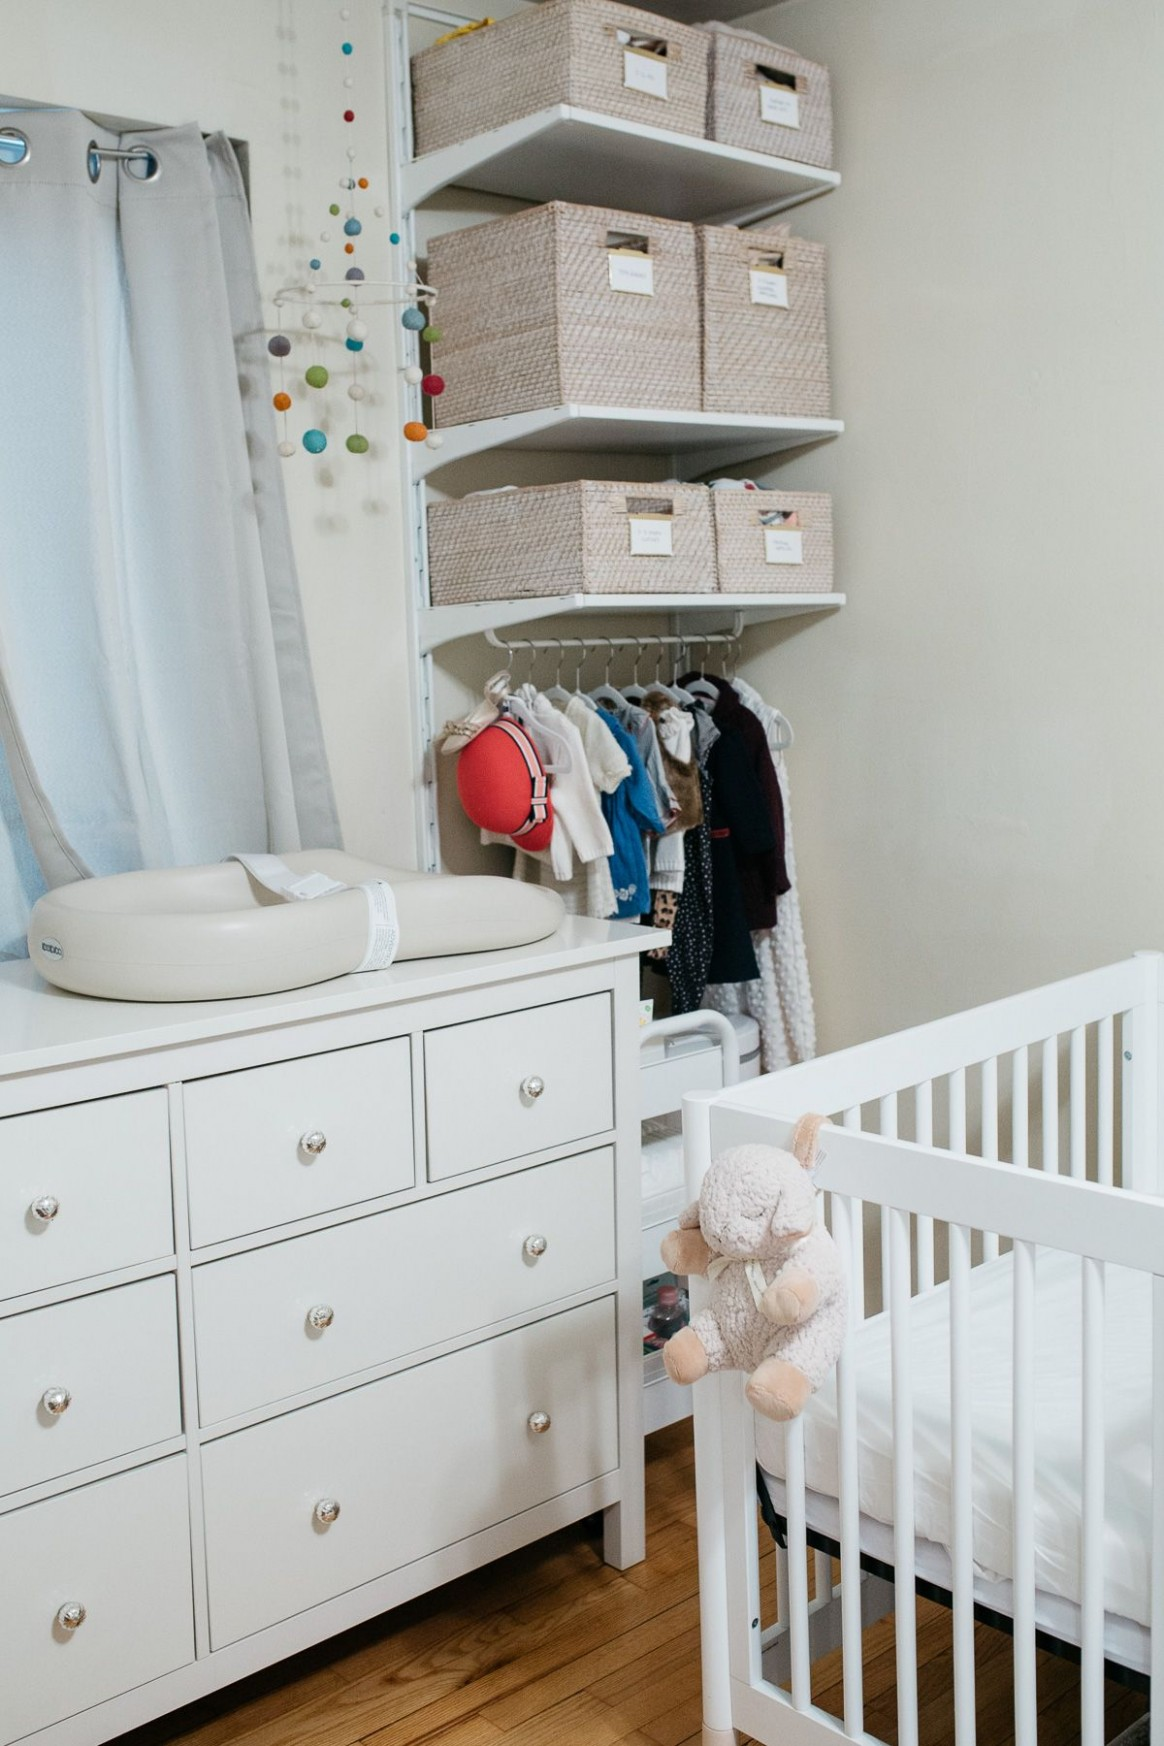 Shared Nursery Organization Ideas for a Small Apartment  - Baby Room Storage Ideas